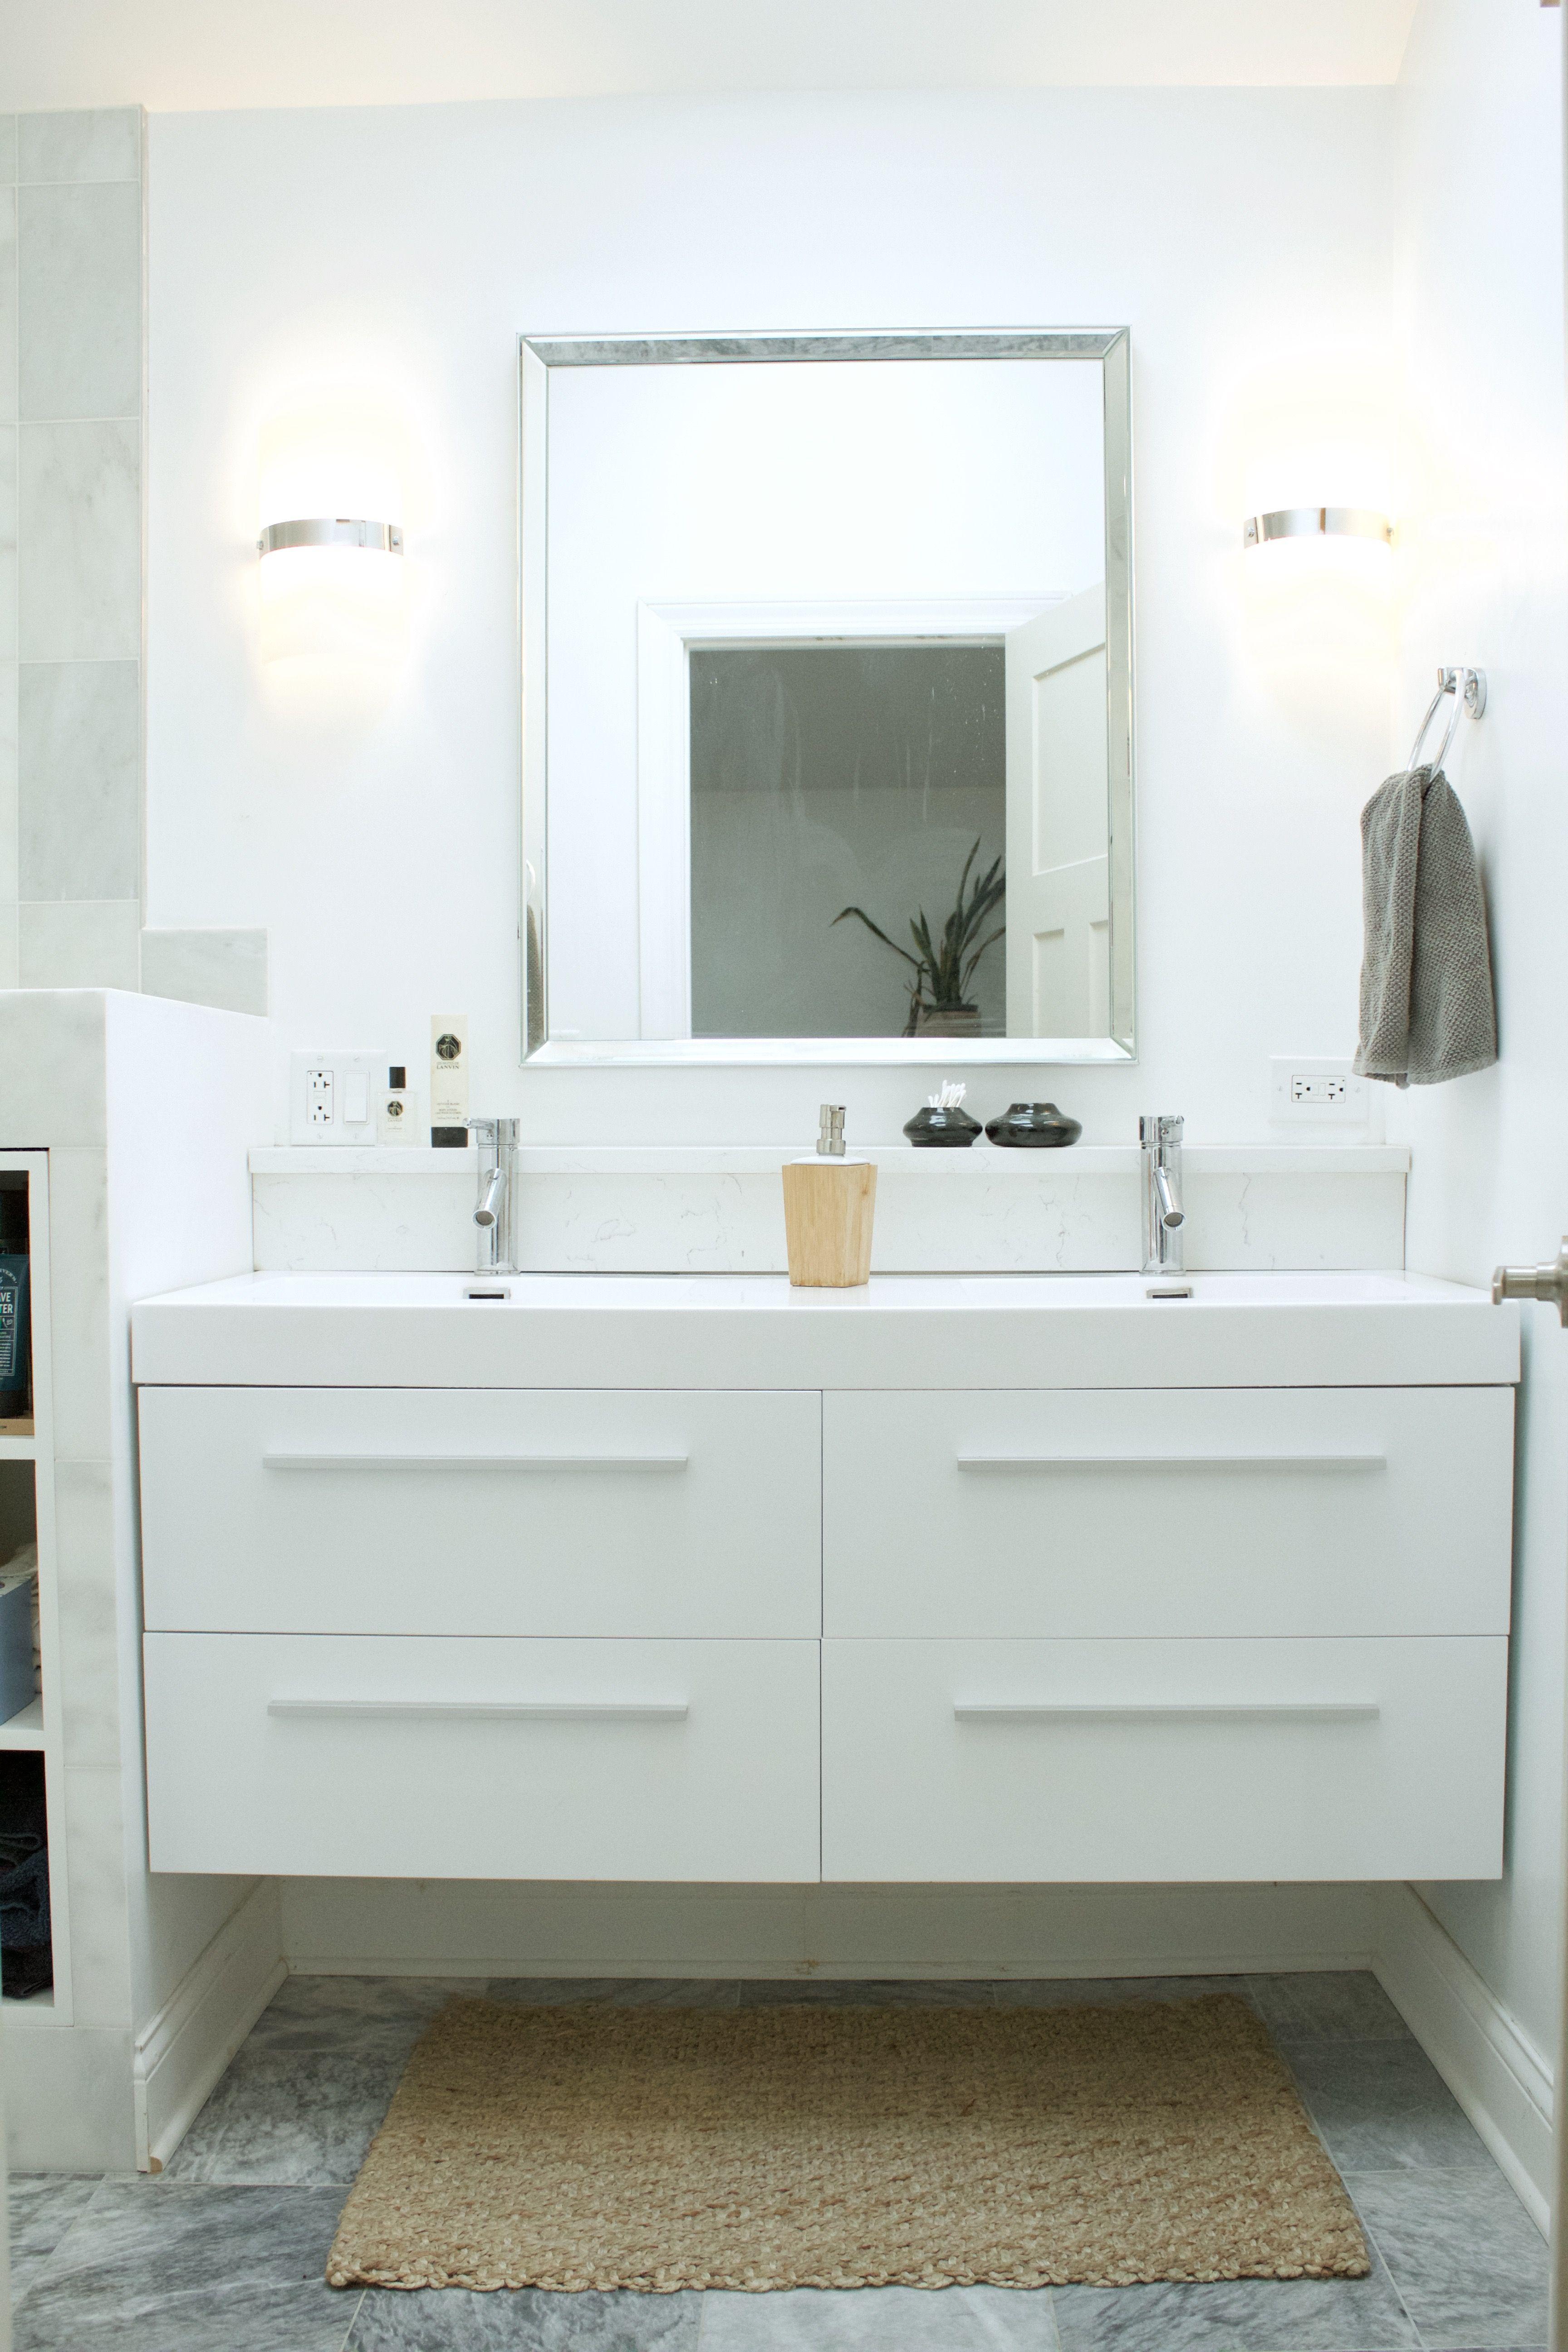 Pin By Helene On Bathroom Design Double Sink Bathroom Cabinets Modern White Bathroom Home Depot Bathroom Vanity